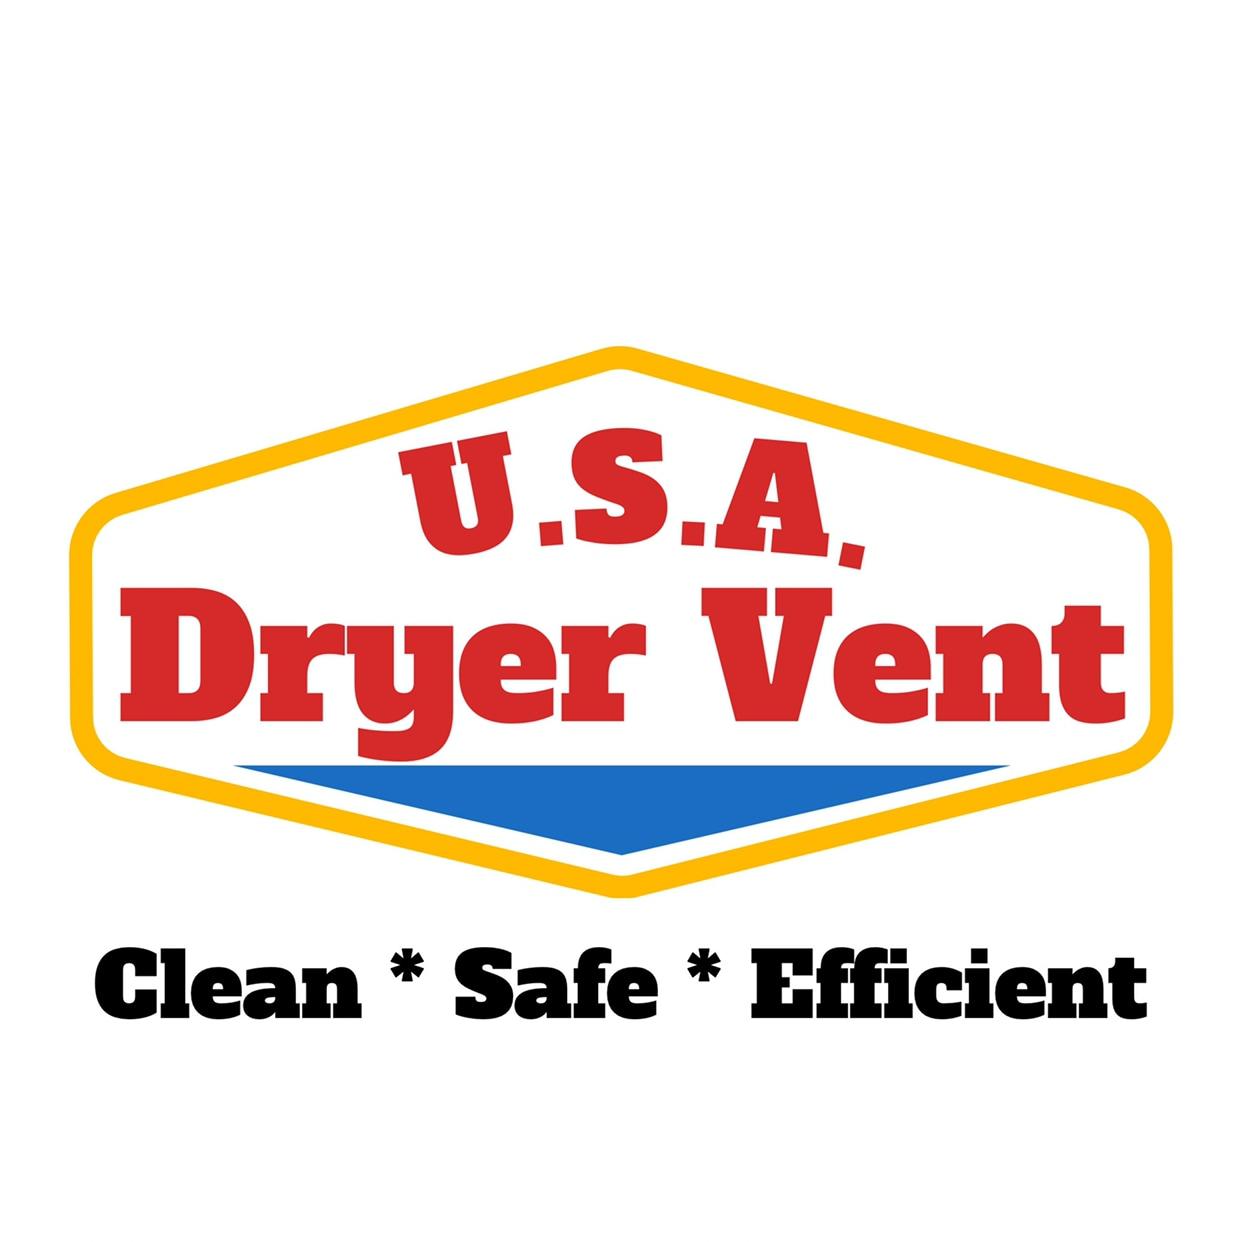 U.S.A. Dryer Vent, LLC logo